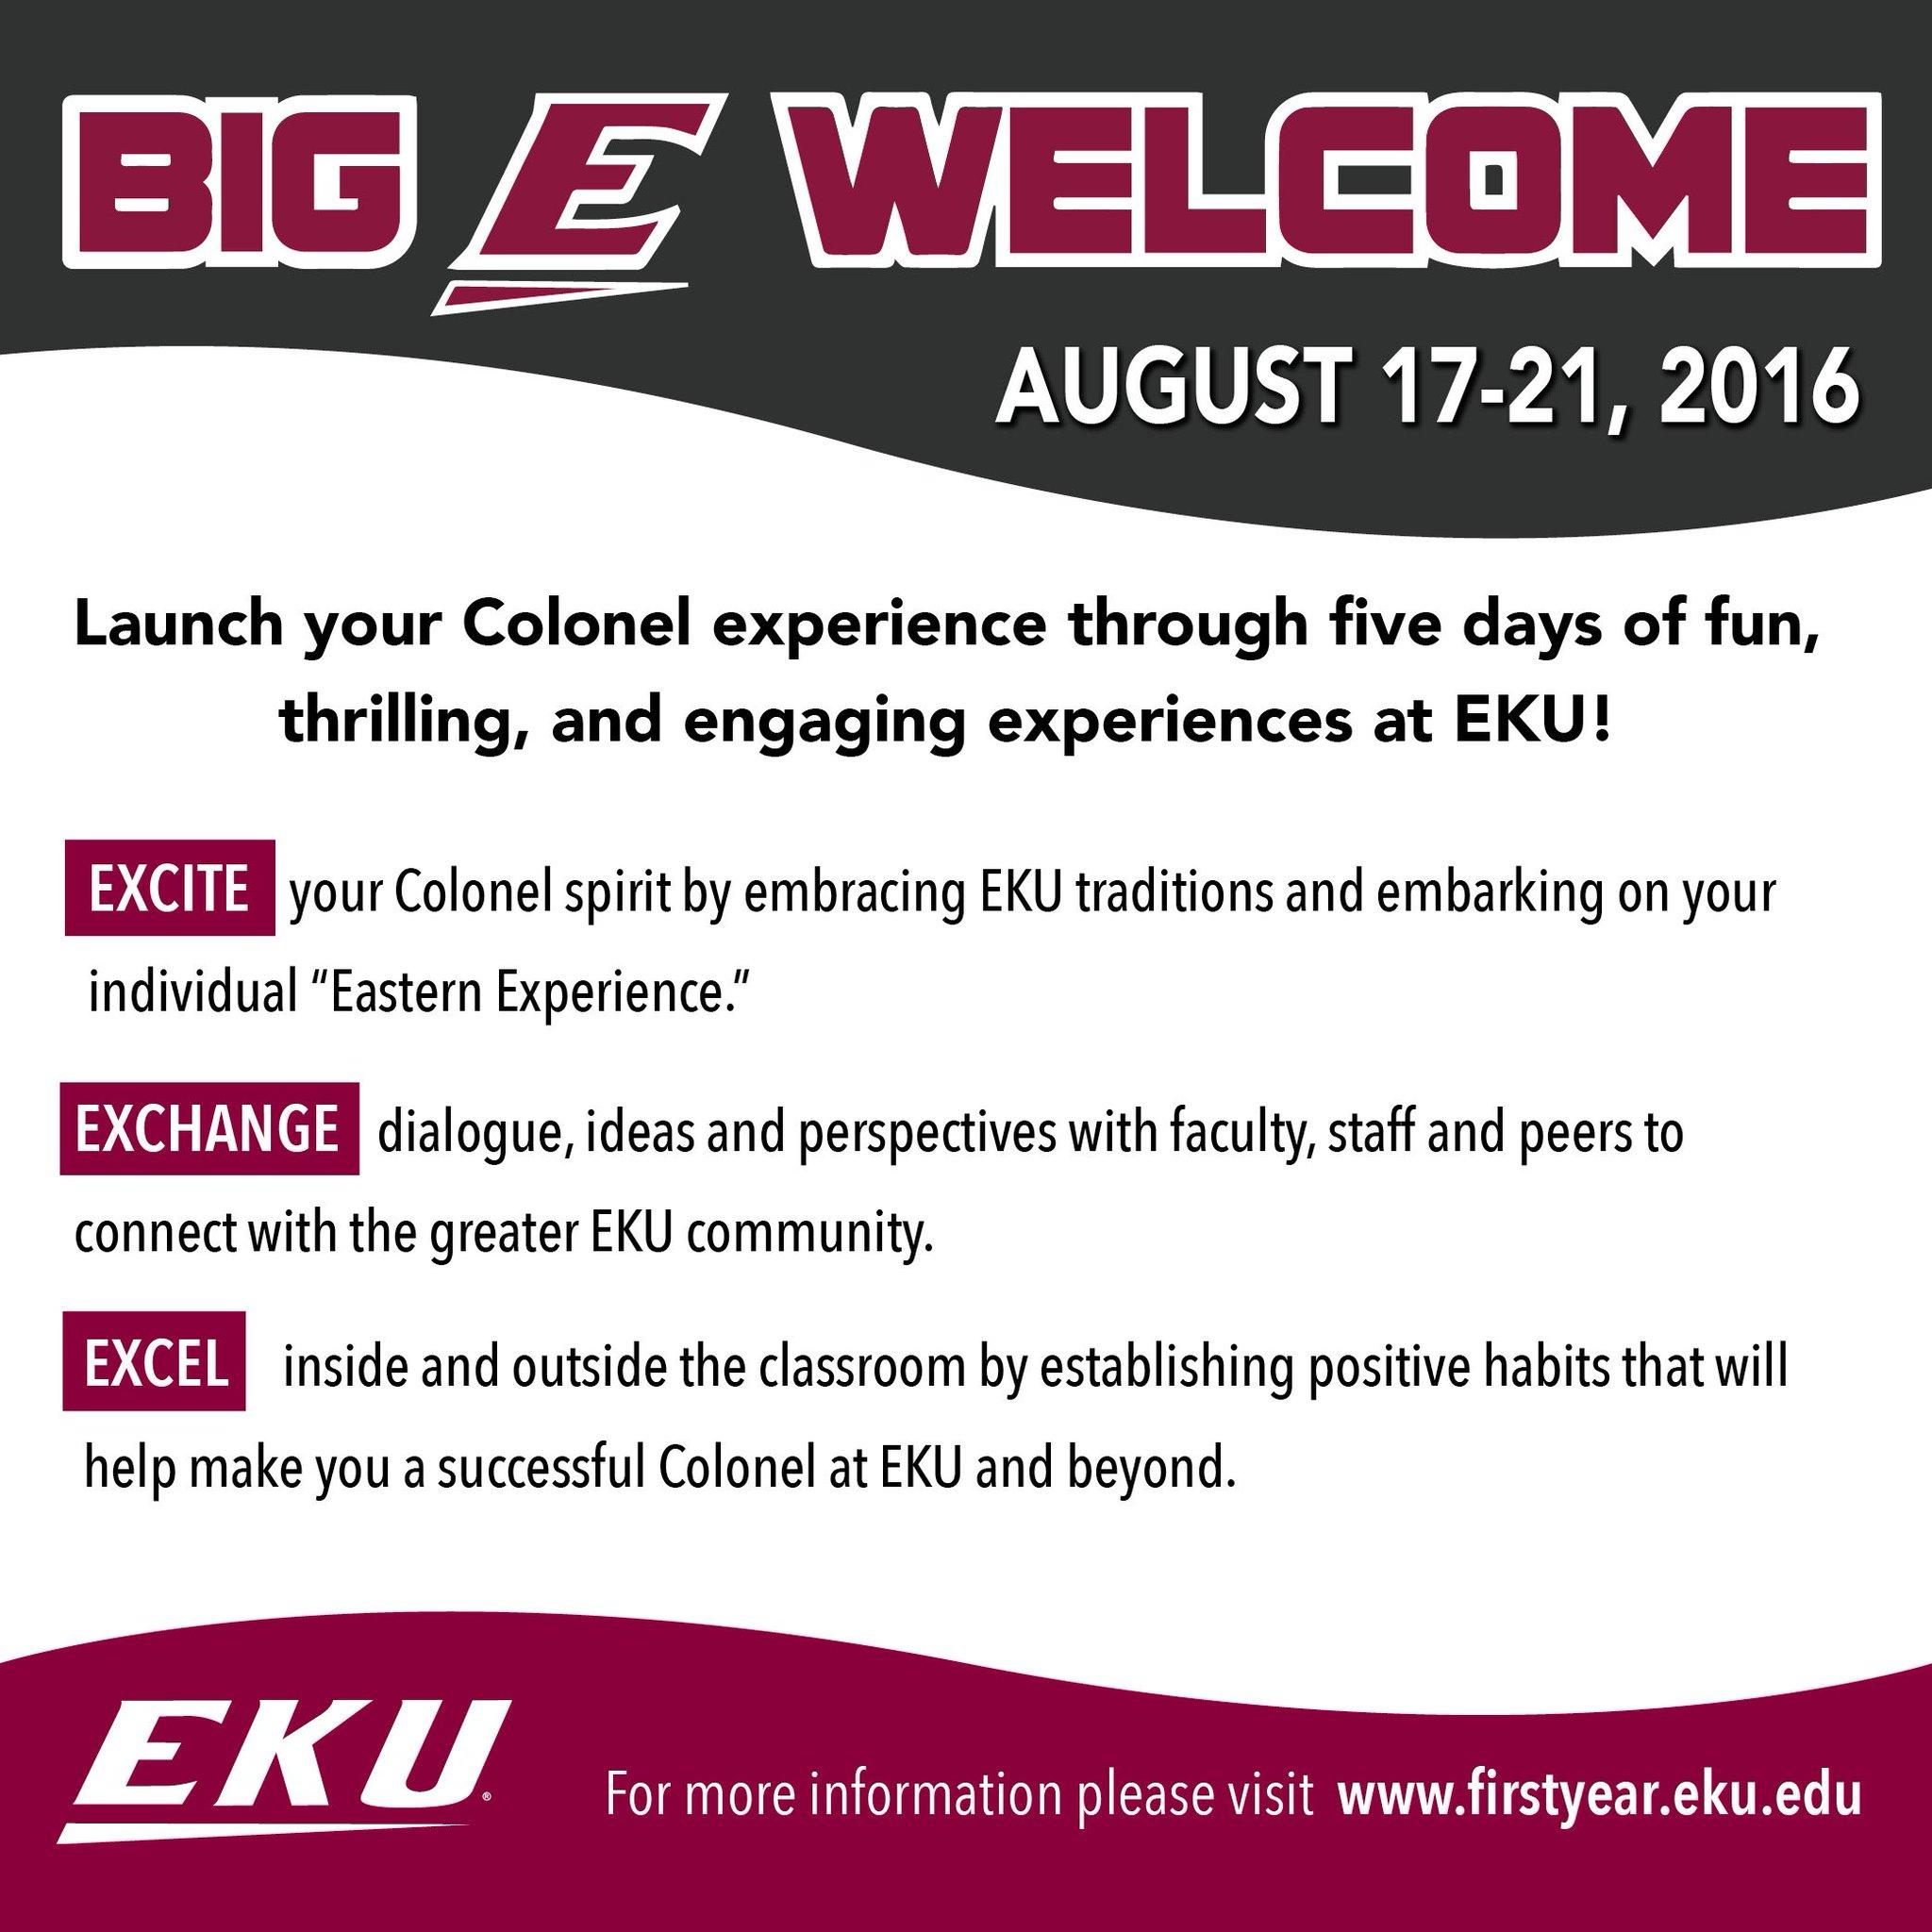 This week it all begins. #BigEWelcome #EKU https://t.co/dR1V06l4bf